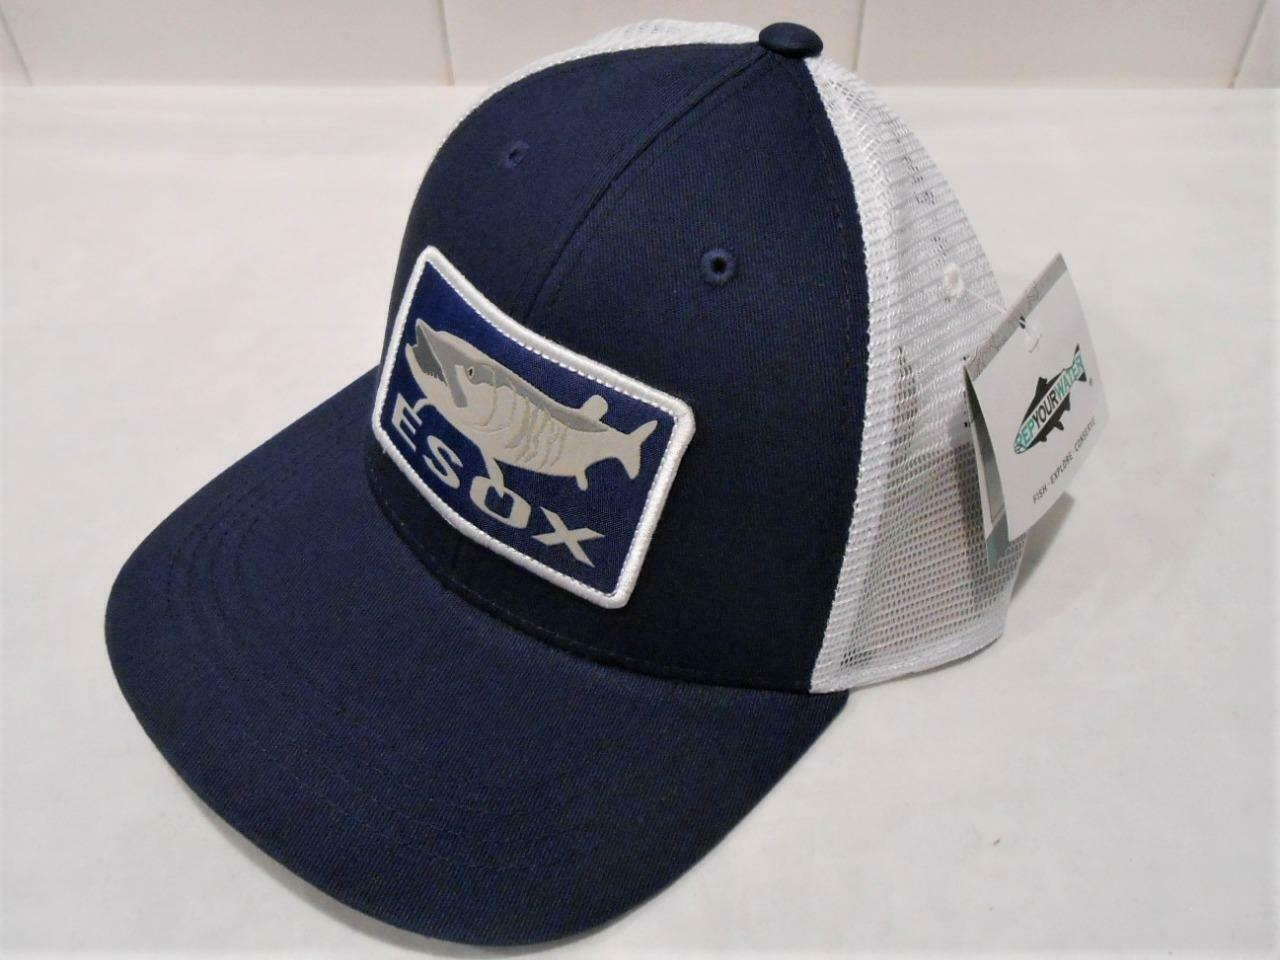 PITY THE BEARDLESS BLACK MESH TRUCKER HAT W// ENAMEL PIN ADJUSTABLE SNAPBACK CAP